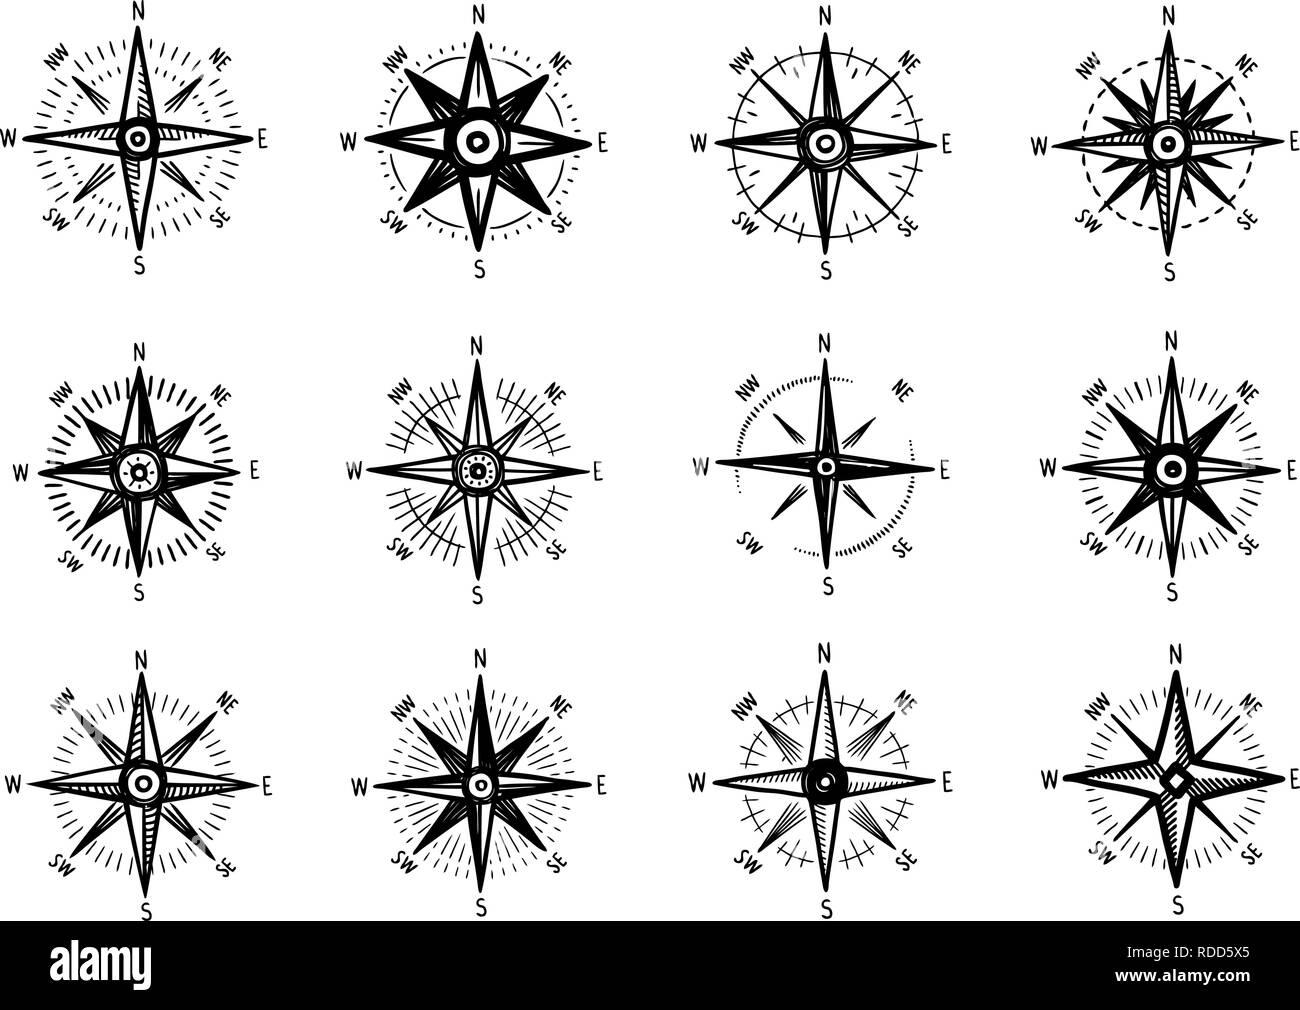 Compass, wind rose icon set. Marine navigation symbol. Sketch vector illustration - Stock Image